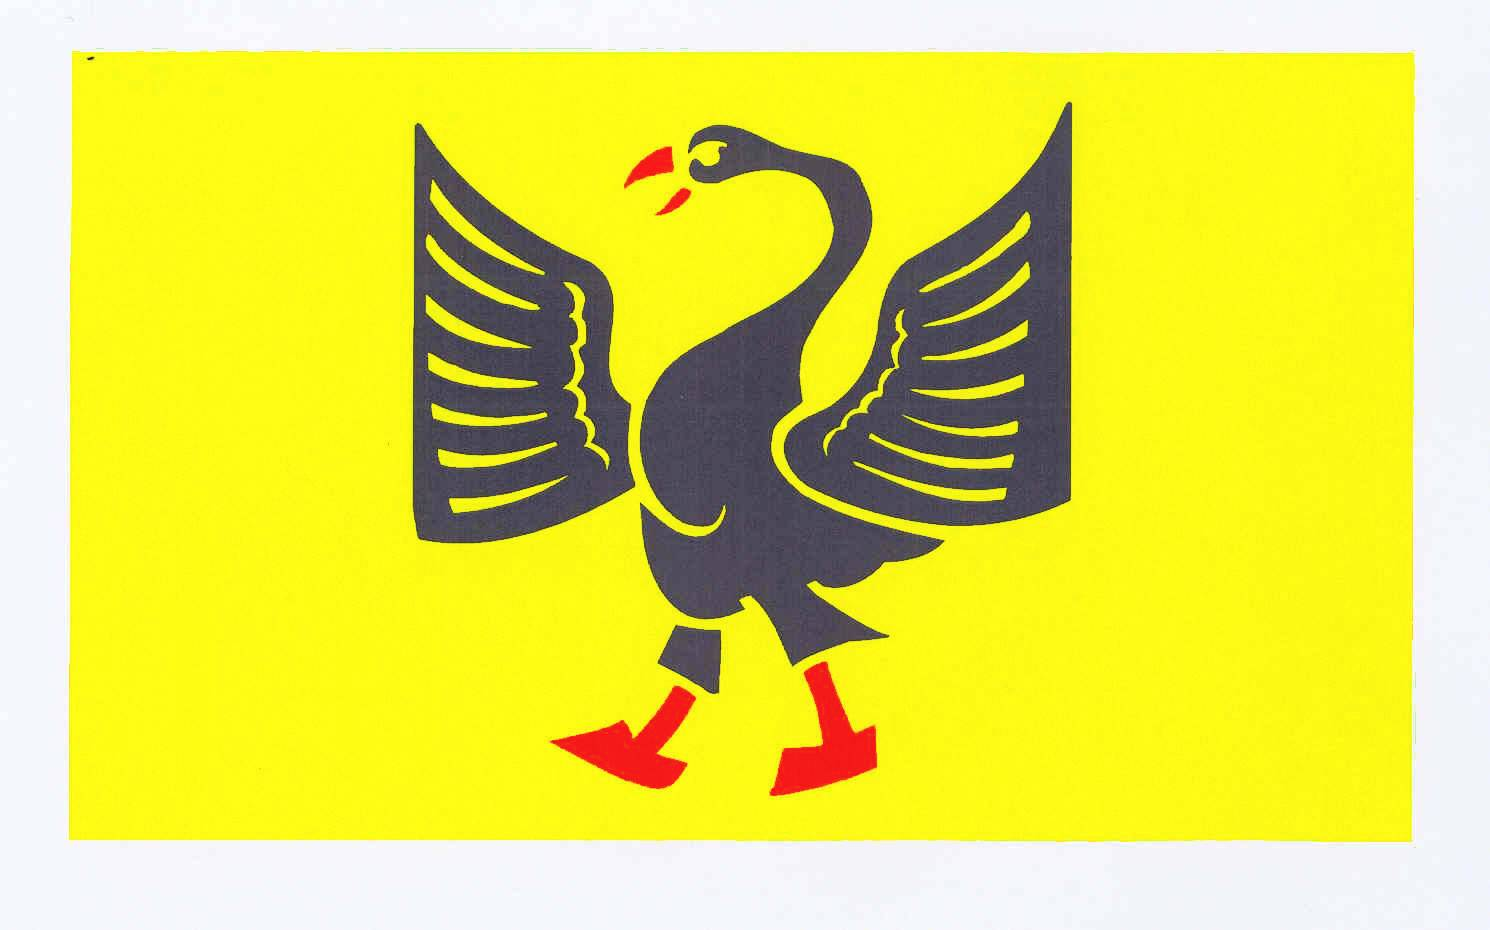 Flagge GemeindeGrevenkop, Kreis Steinburg